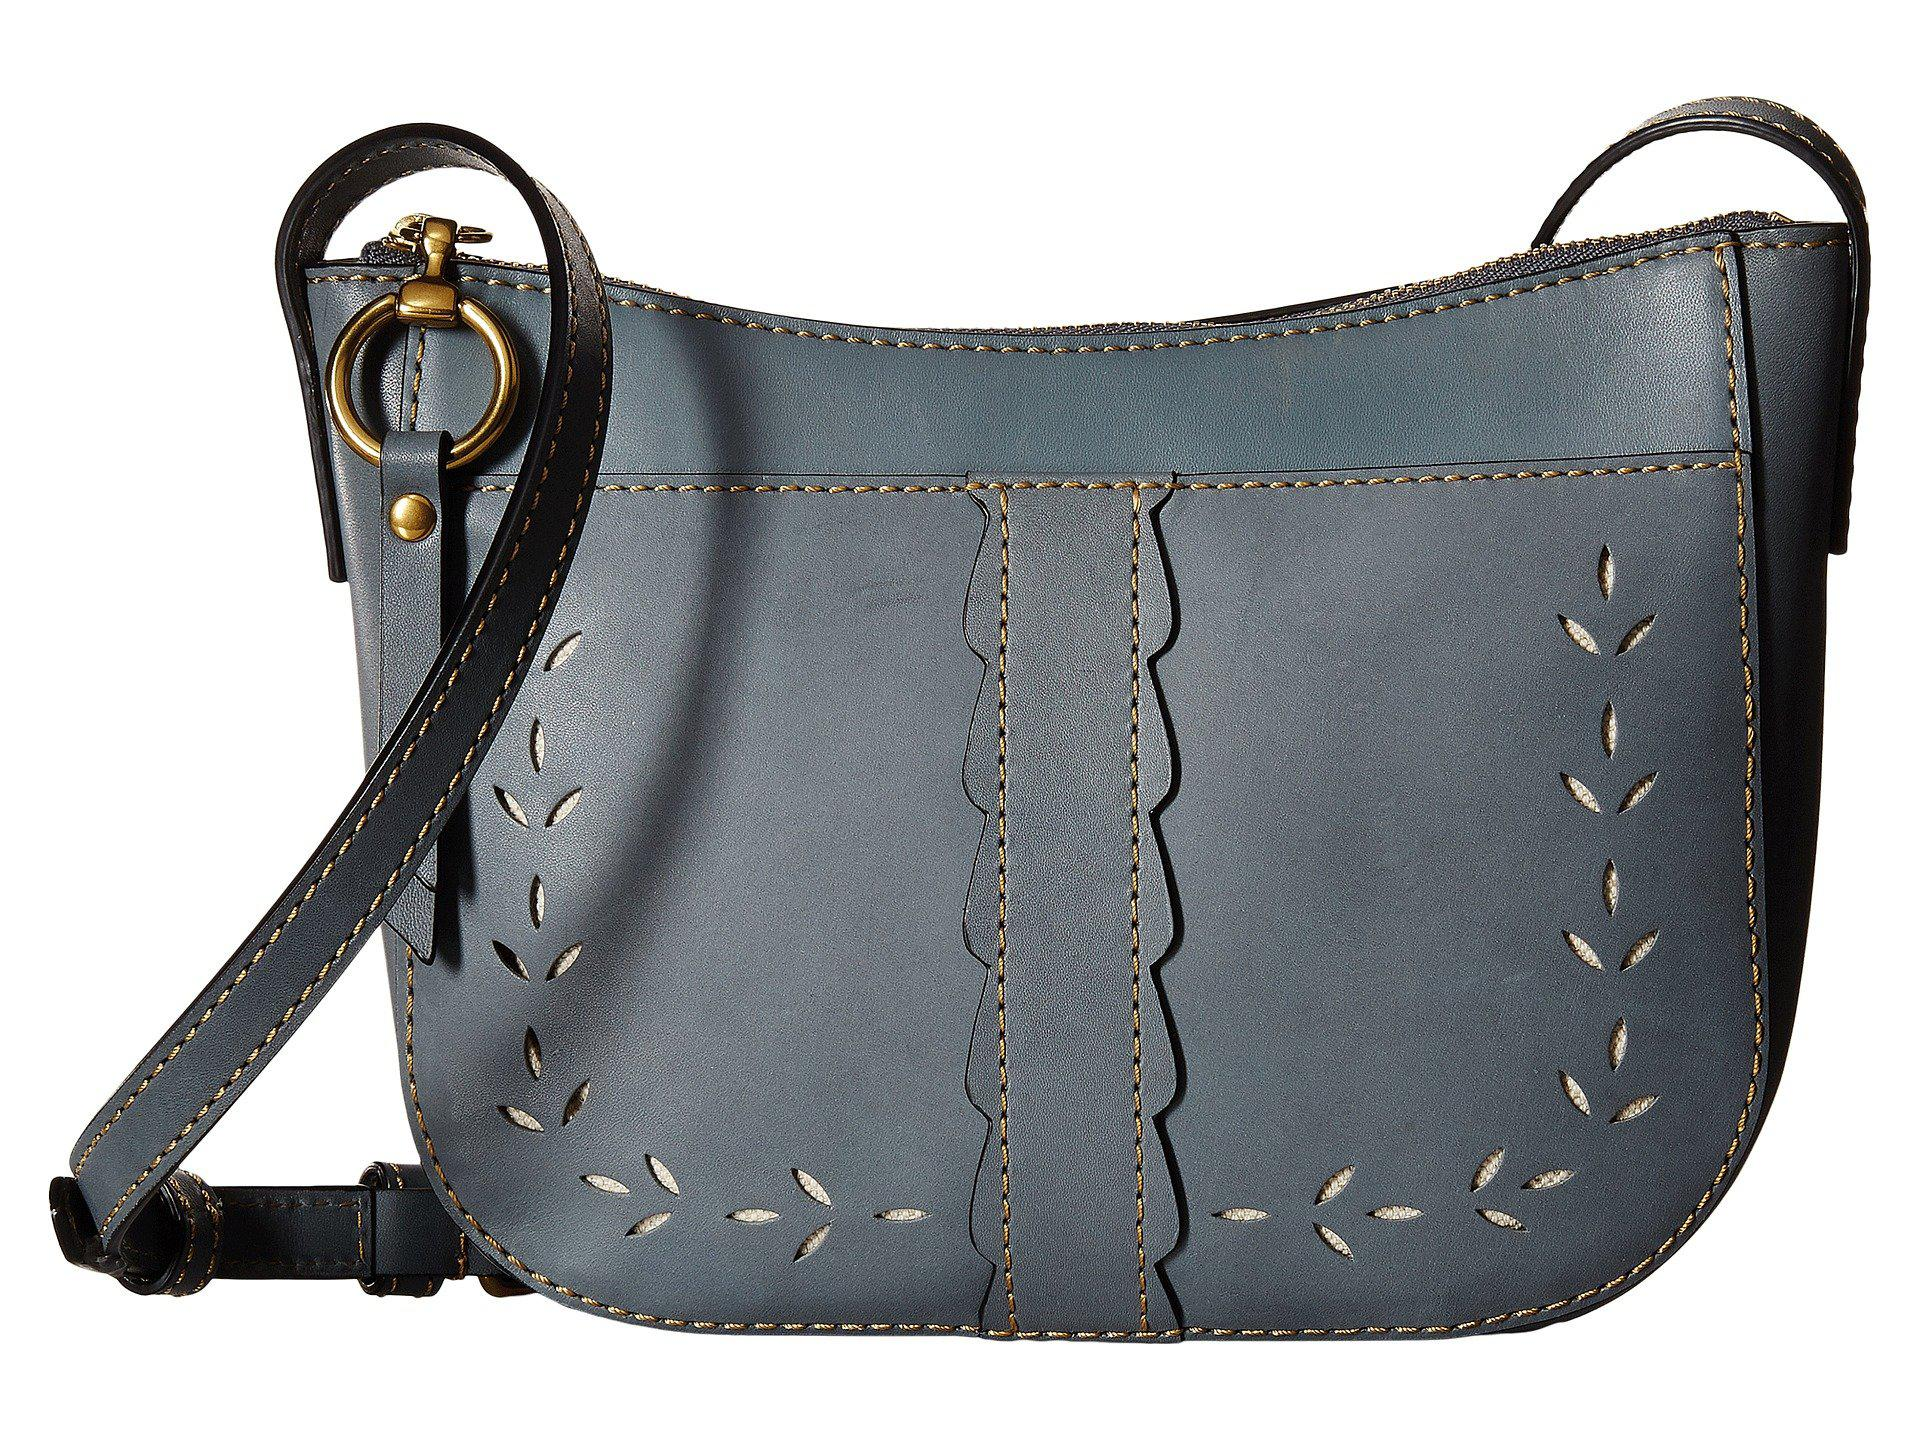 Frye Ilana Perf Zip Crossbody (White Matte Leather) Cross Body Handbags gtTtIA6b